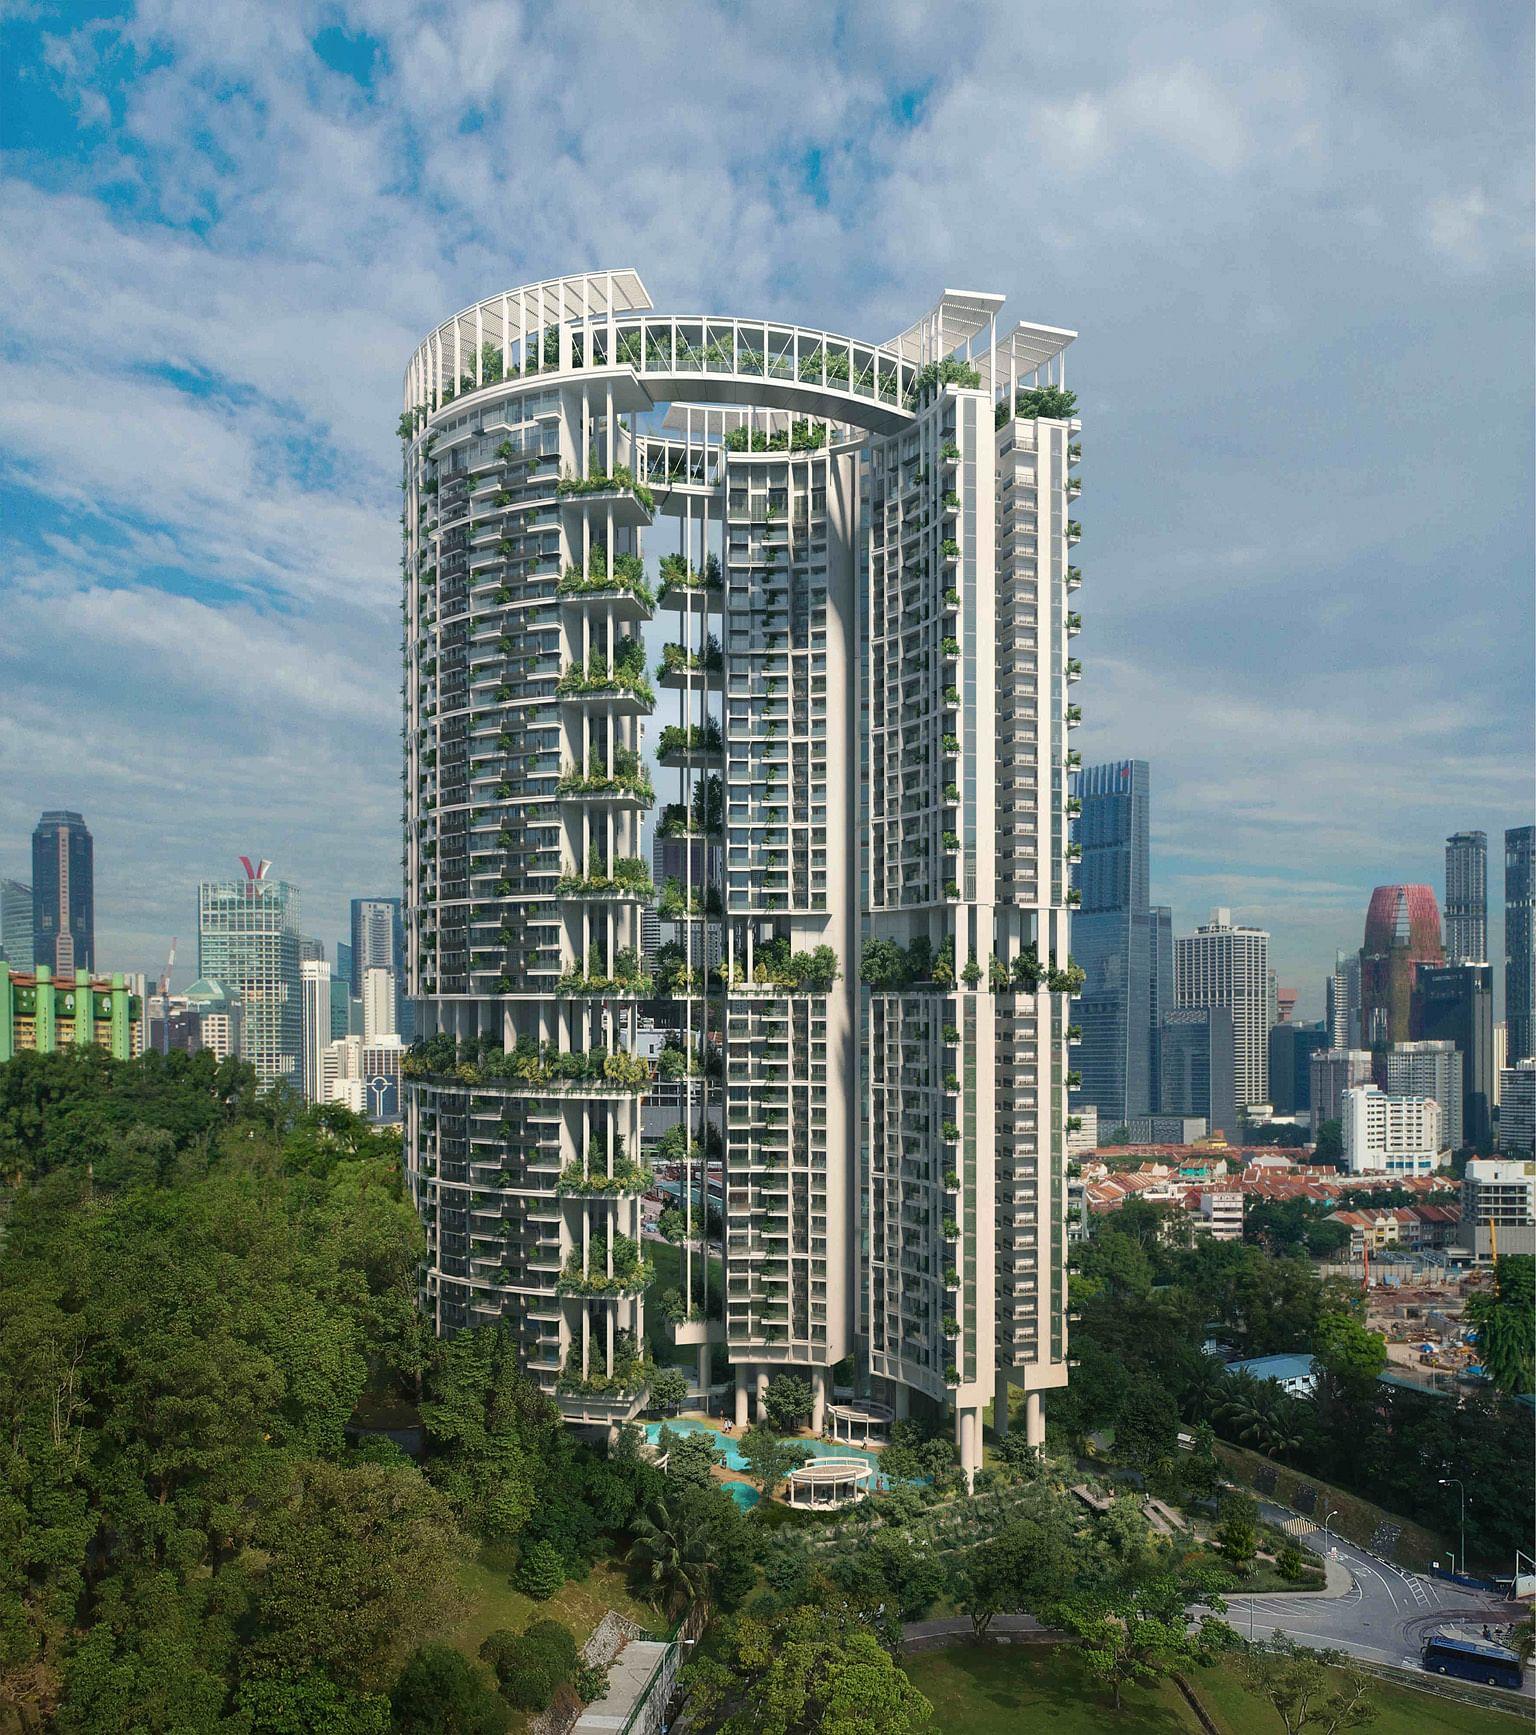 Condo Apartment: Condo Design For Pearl Bank Site Unveiled, Singapore News